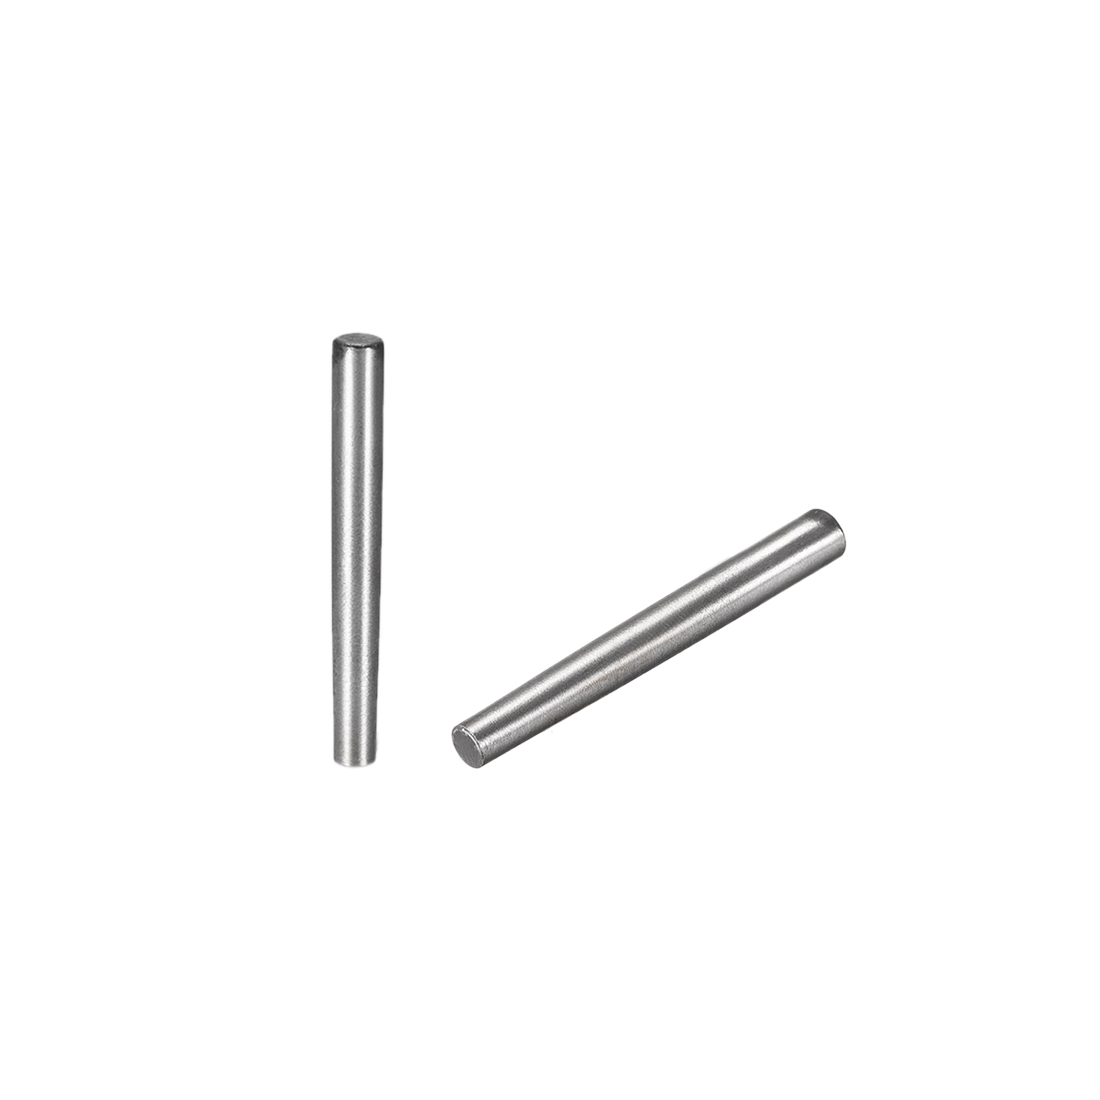 Carbon Steel GB117 40mm Length 4mmx4.8mm Small End Diameter 1:50 Taper Pin 5Pcs